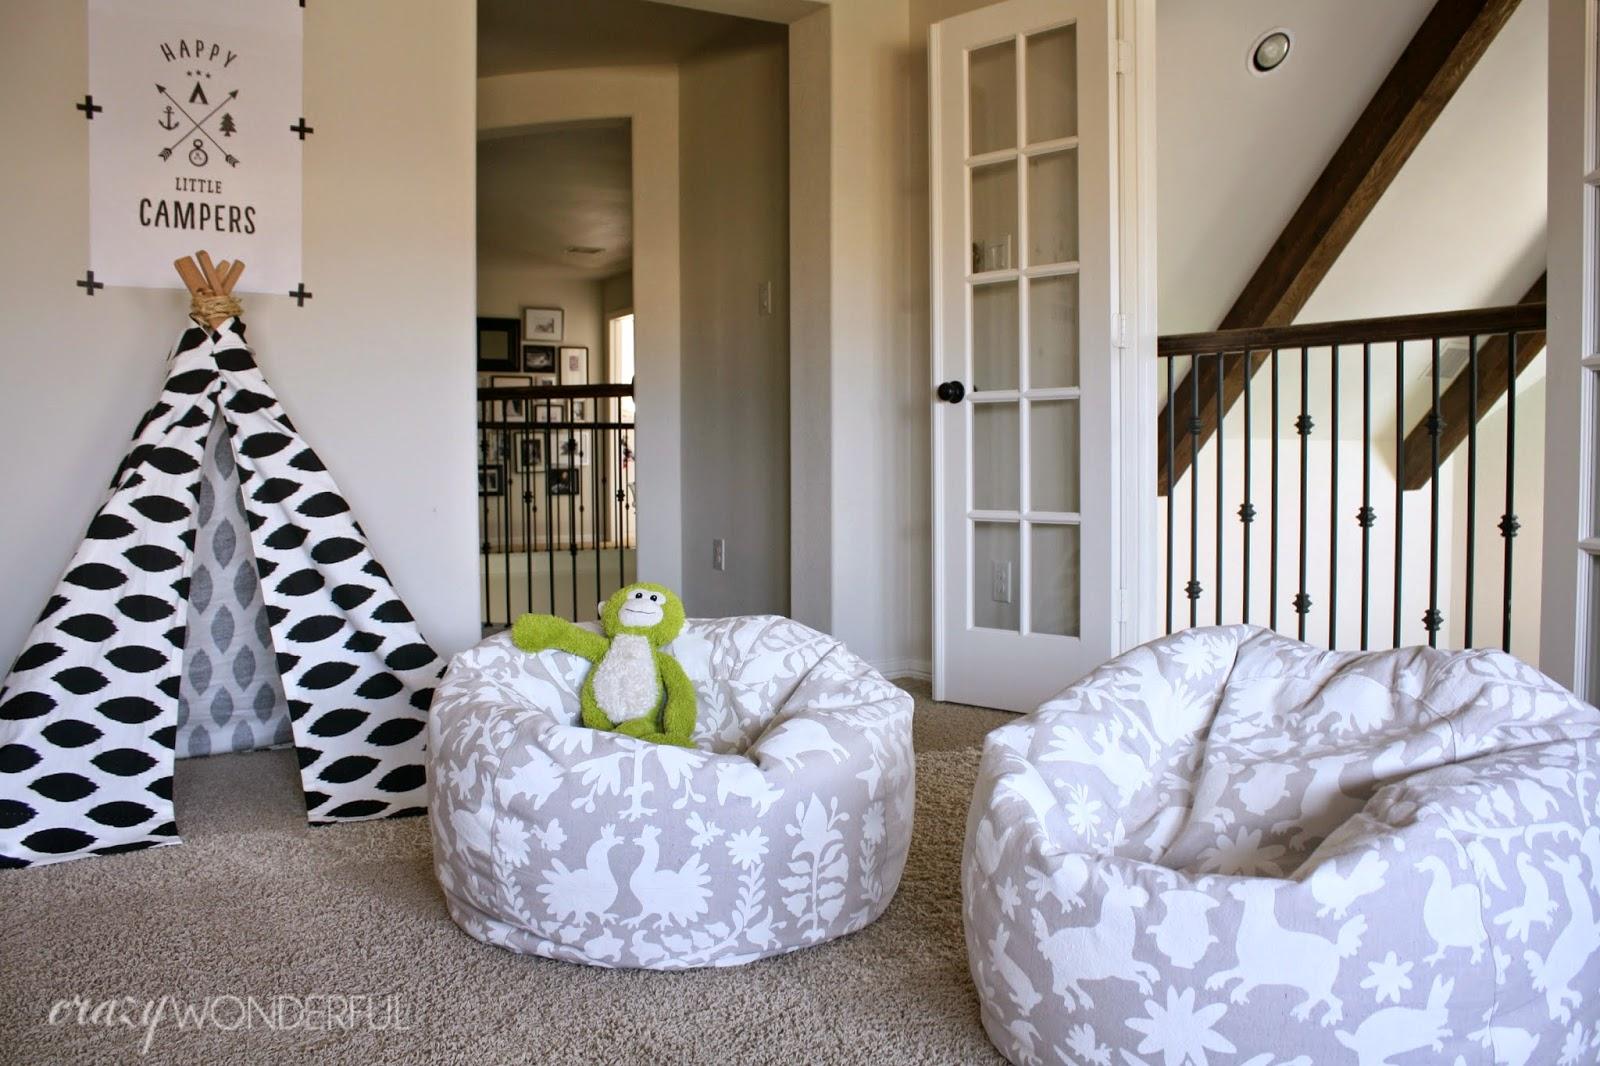 Enjoyable Diy Frame For Bean Bag Couch How To Make A Diy Couch Texas Machost Co Dining Chair Design Ideas Machostcouk